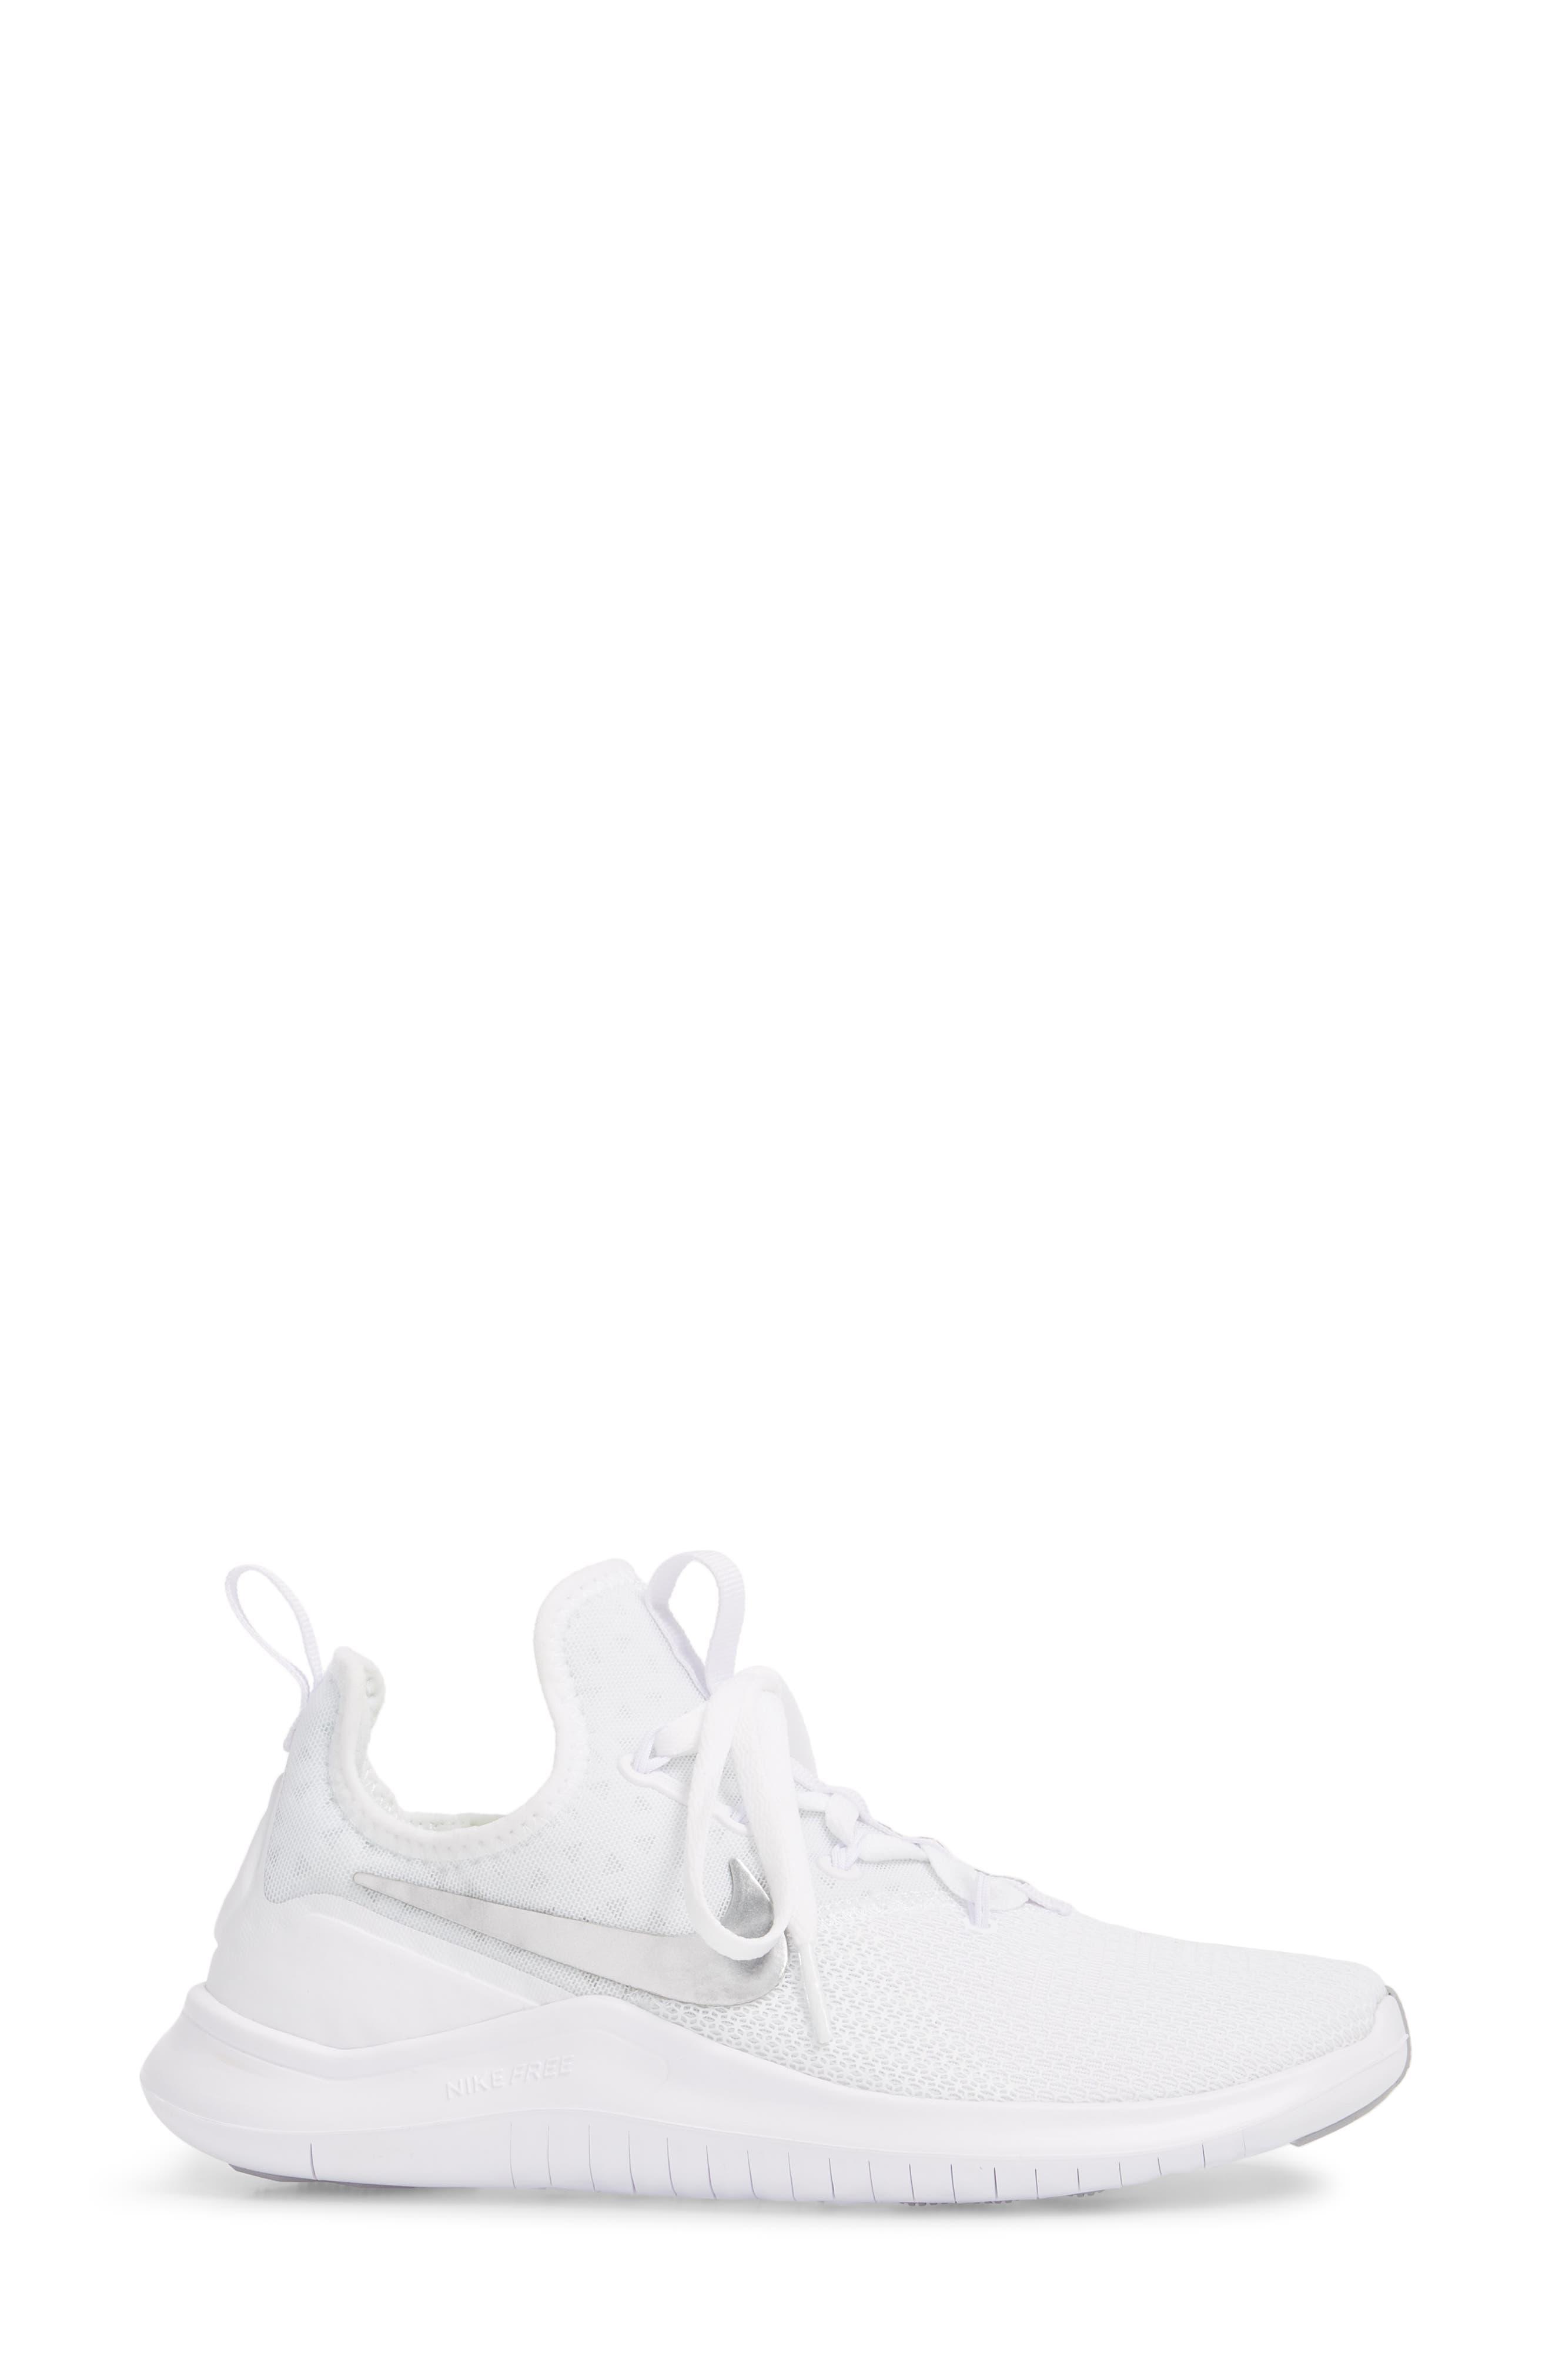 Free TR8 Training Shoe,                             Alternate thumbnail 3, color,                             White/ Metallic Silver/ White